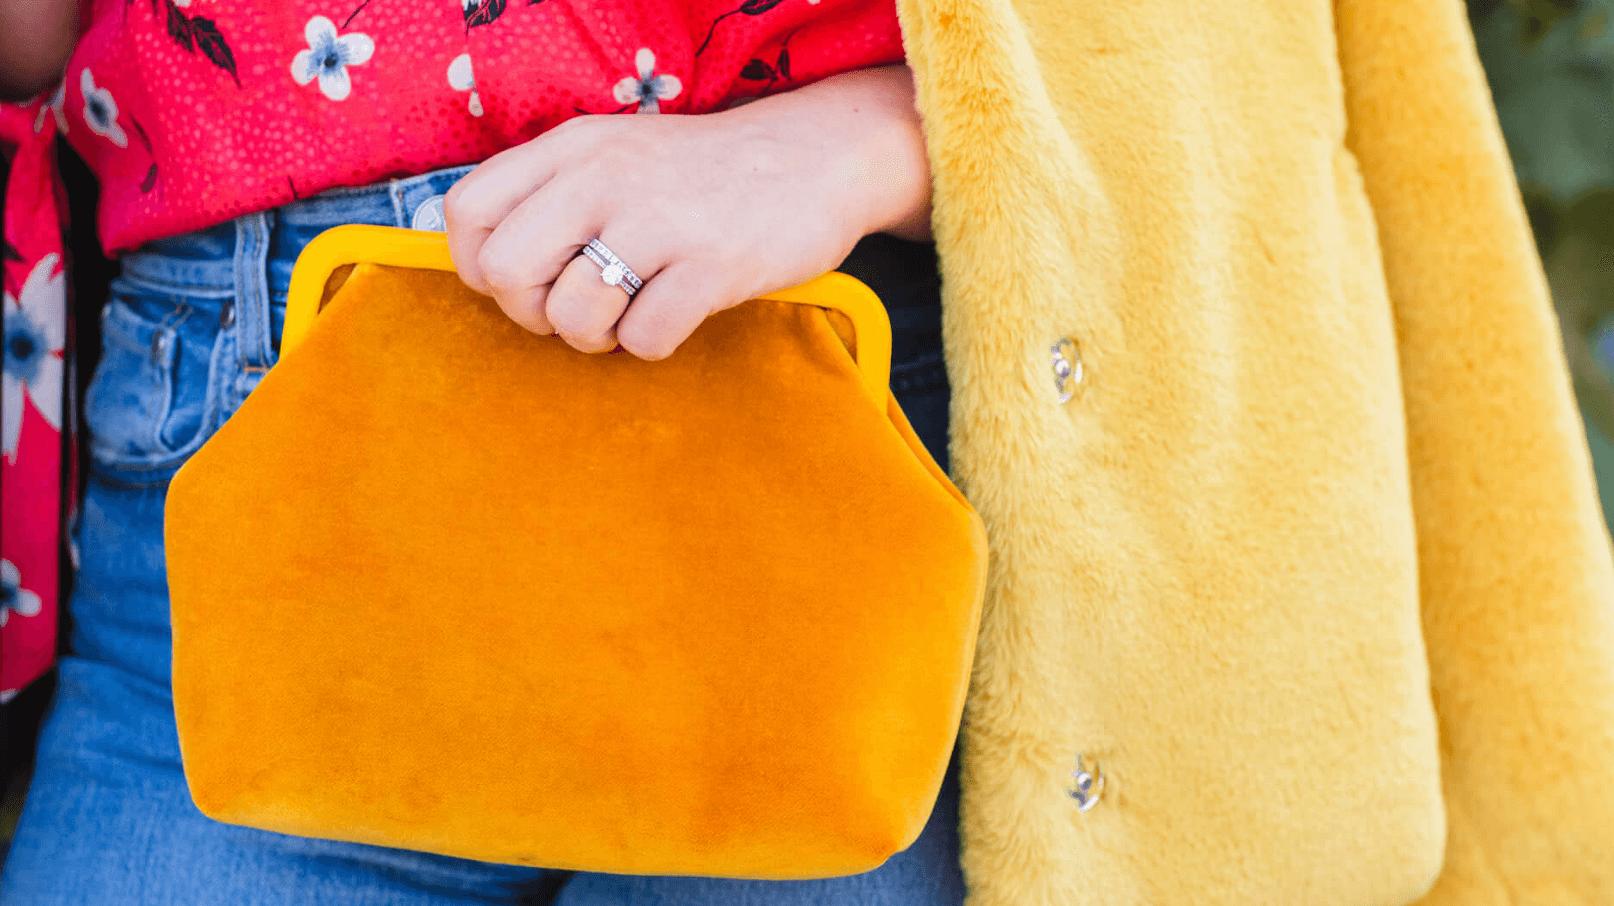 Rebecca Taylor Blouse Yellow Faux Fur Coat Rag & Bone Jeans Look by Modnitsa Styling